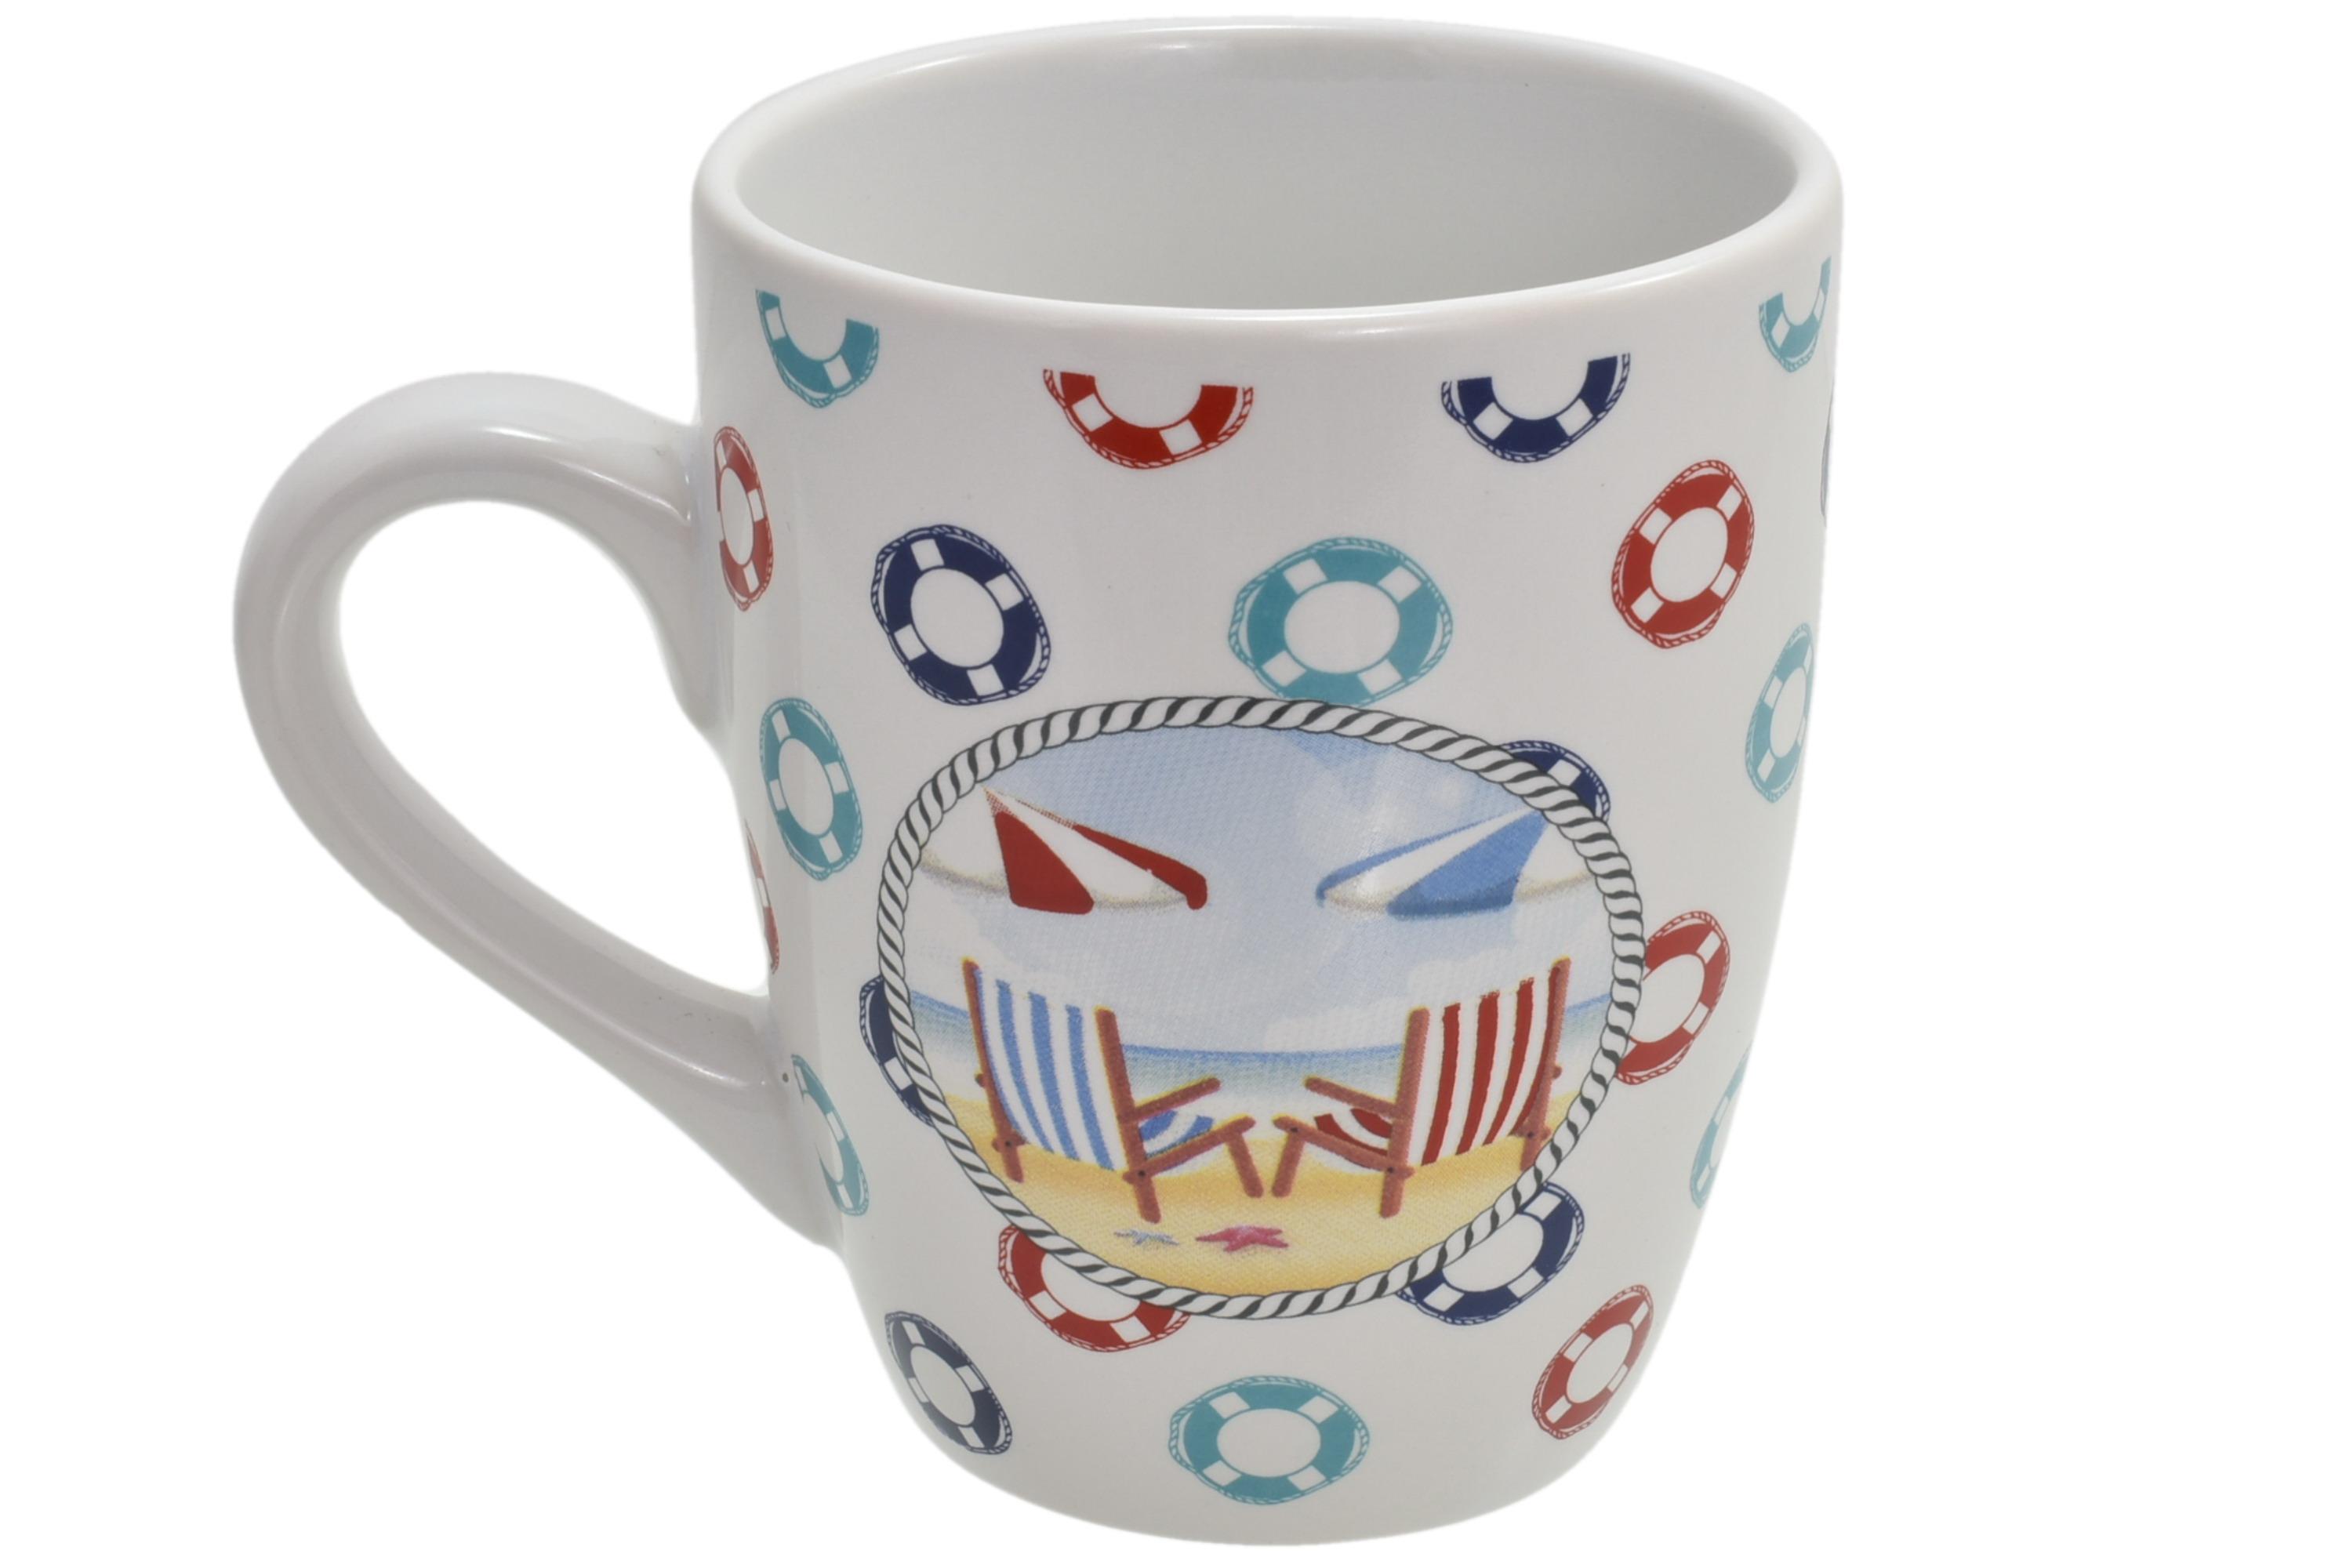 Ceramic Deck Chairs Design Mug Lifering Print